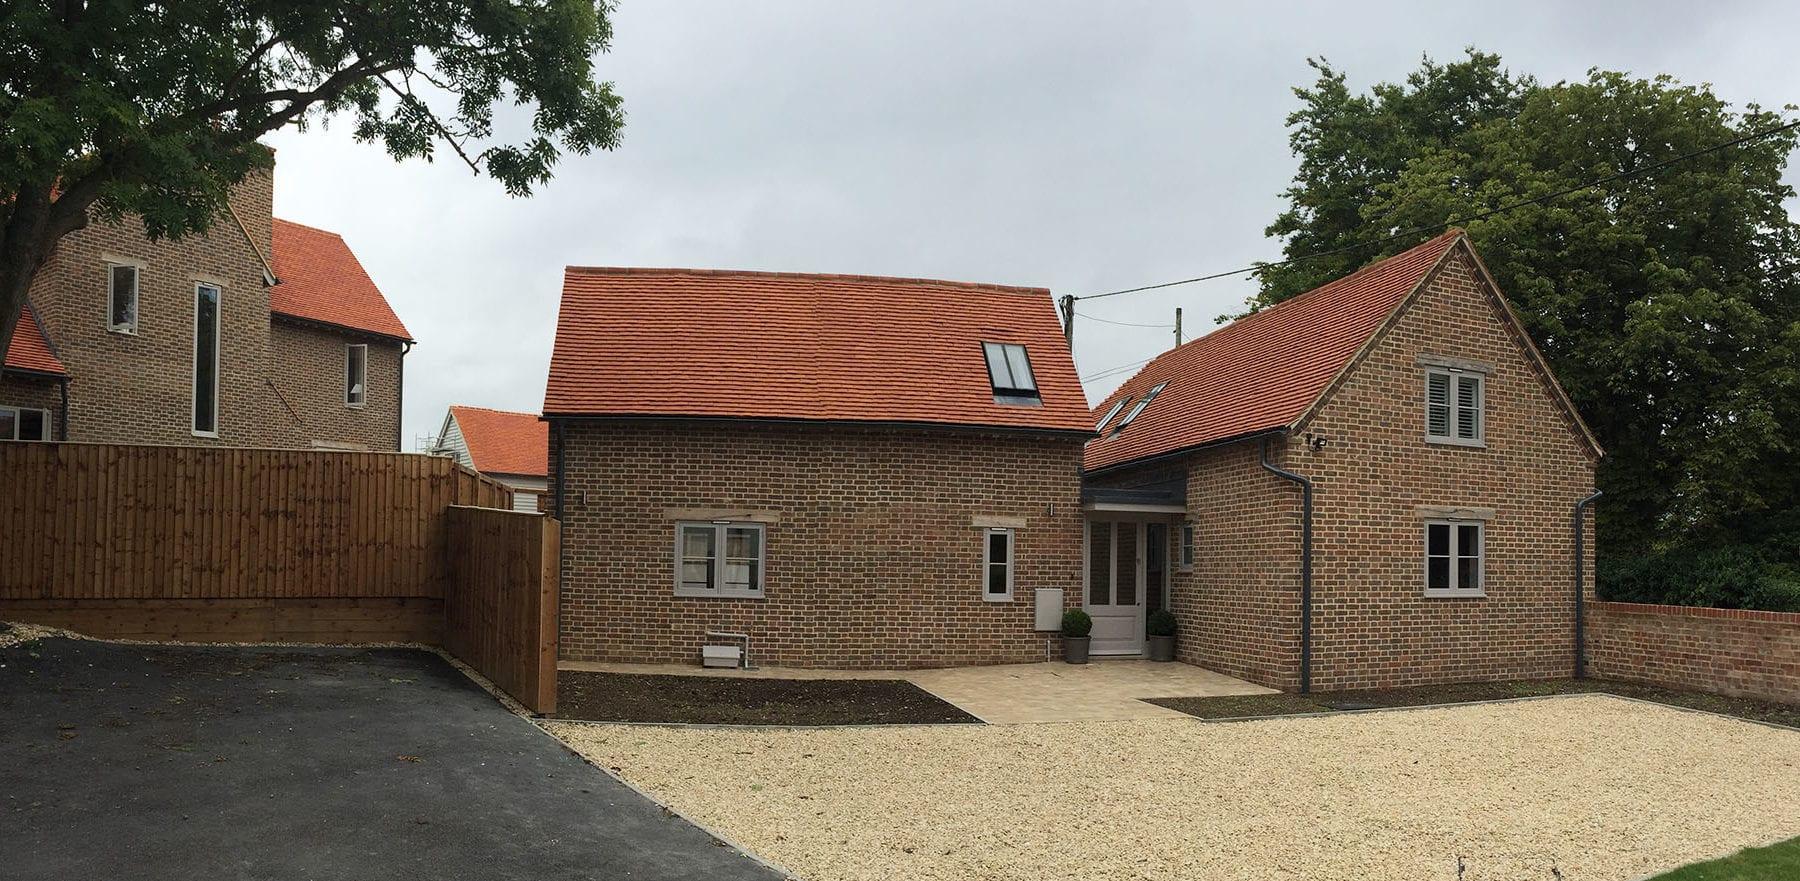 Lifestiles - Handcrafted Orange Clay Roof Tiles - Aston, England 4